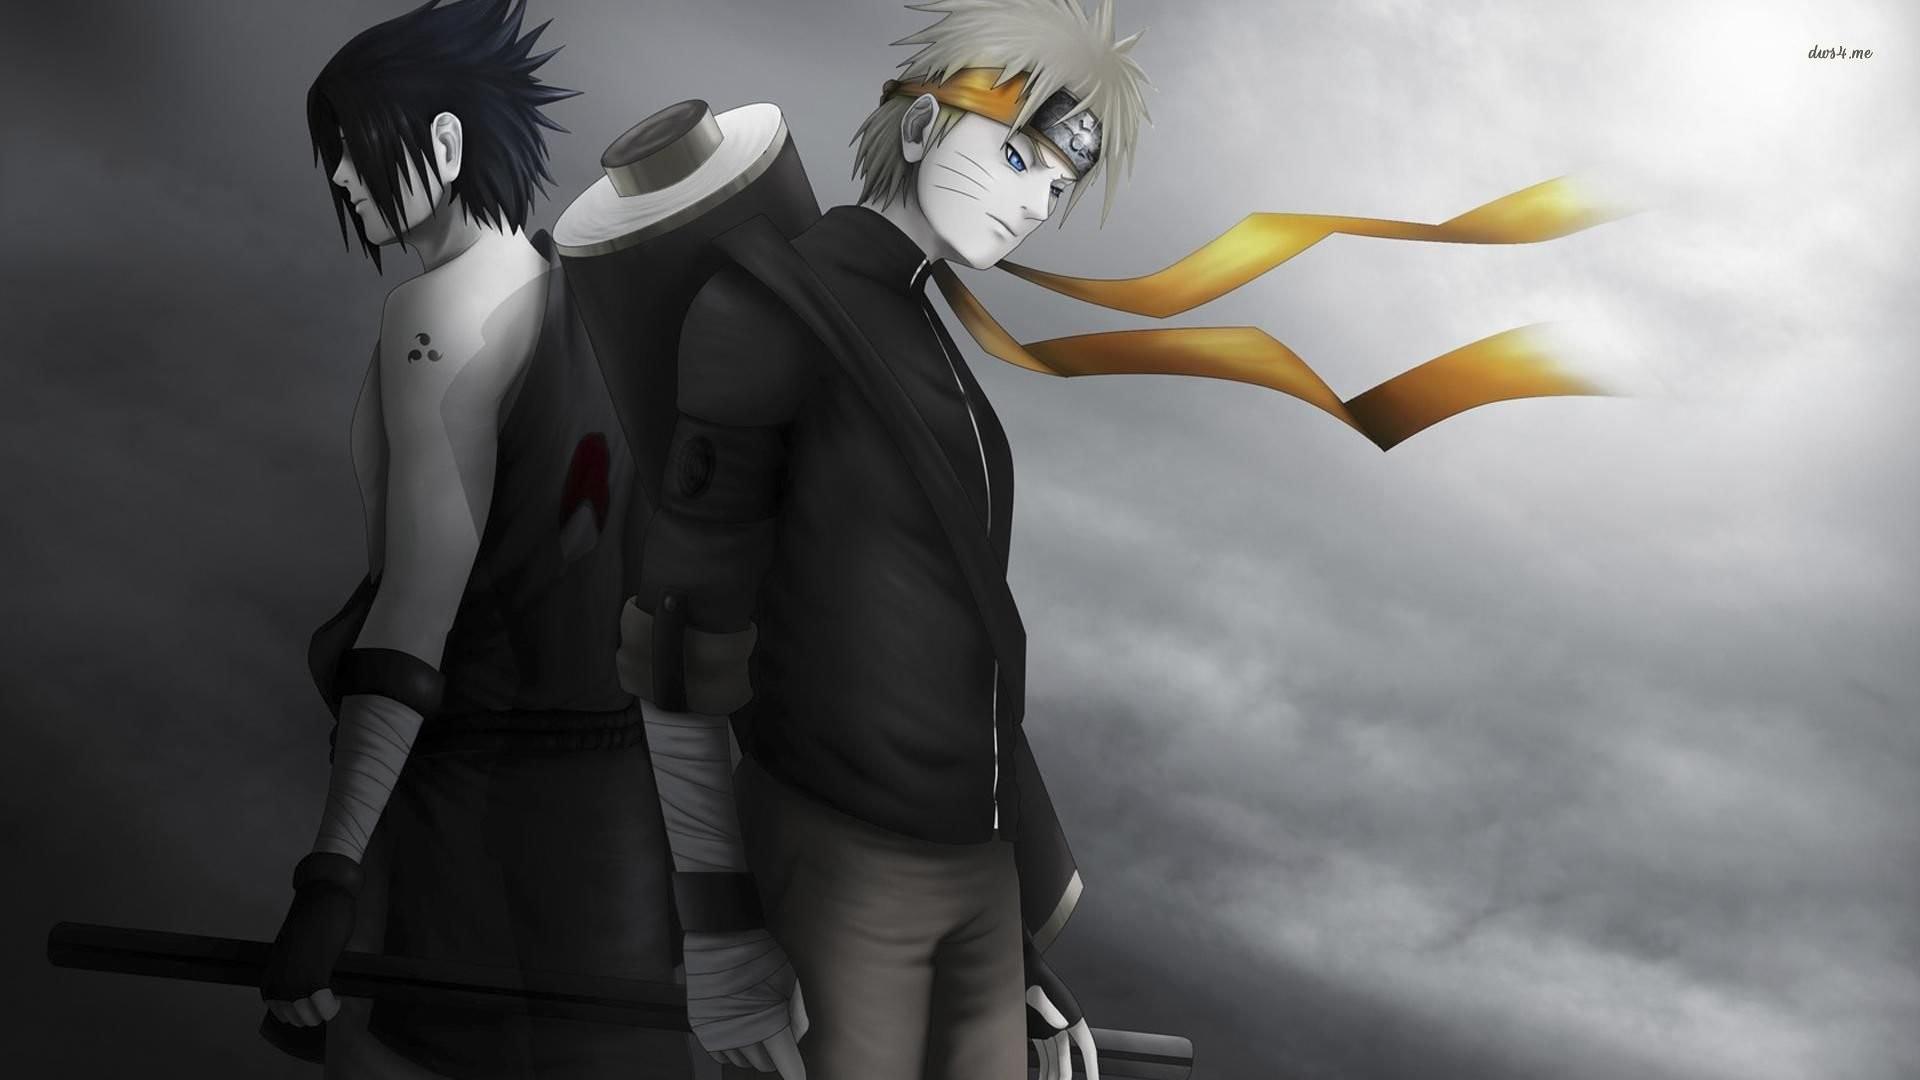 Uzumaki Clan images Naruto Uzumaki HD wallpaper and background